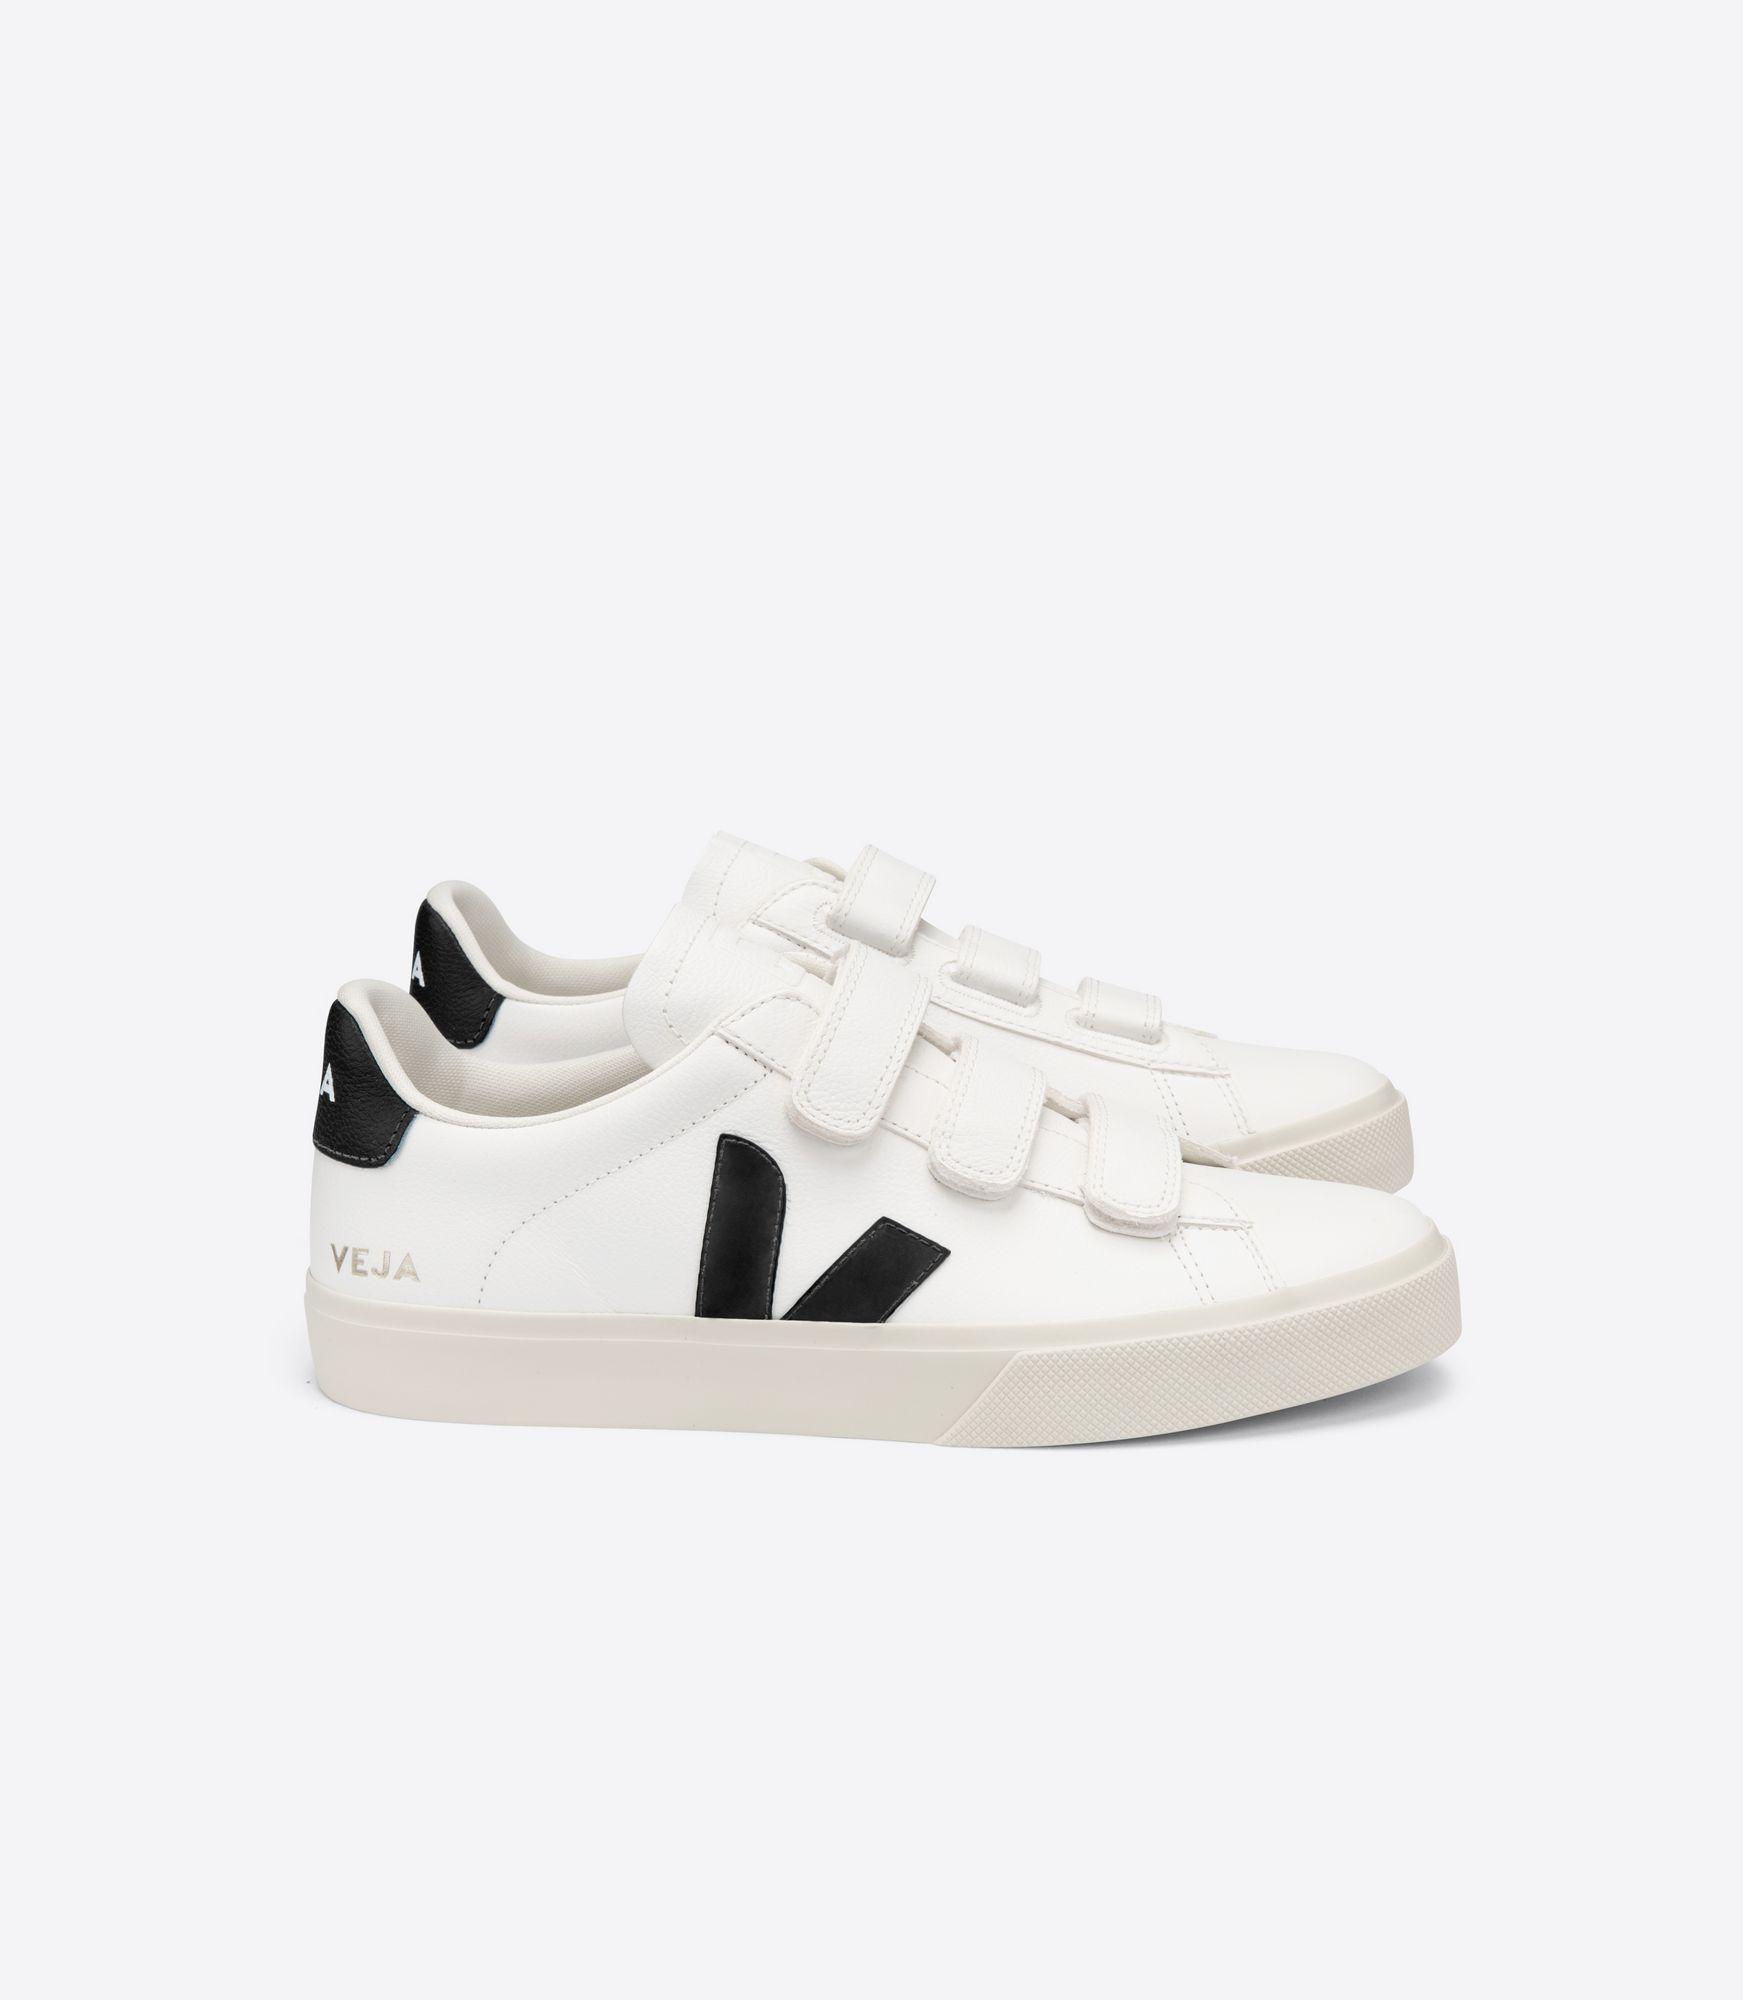 VEJA - Recife - extra-white/black velcro sneaker